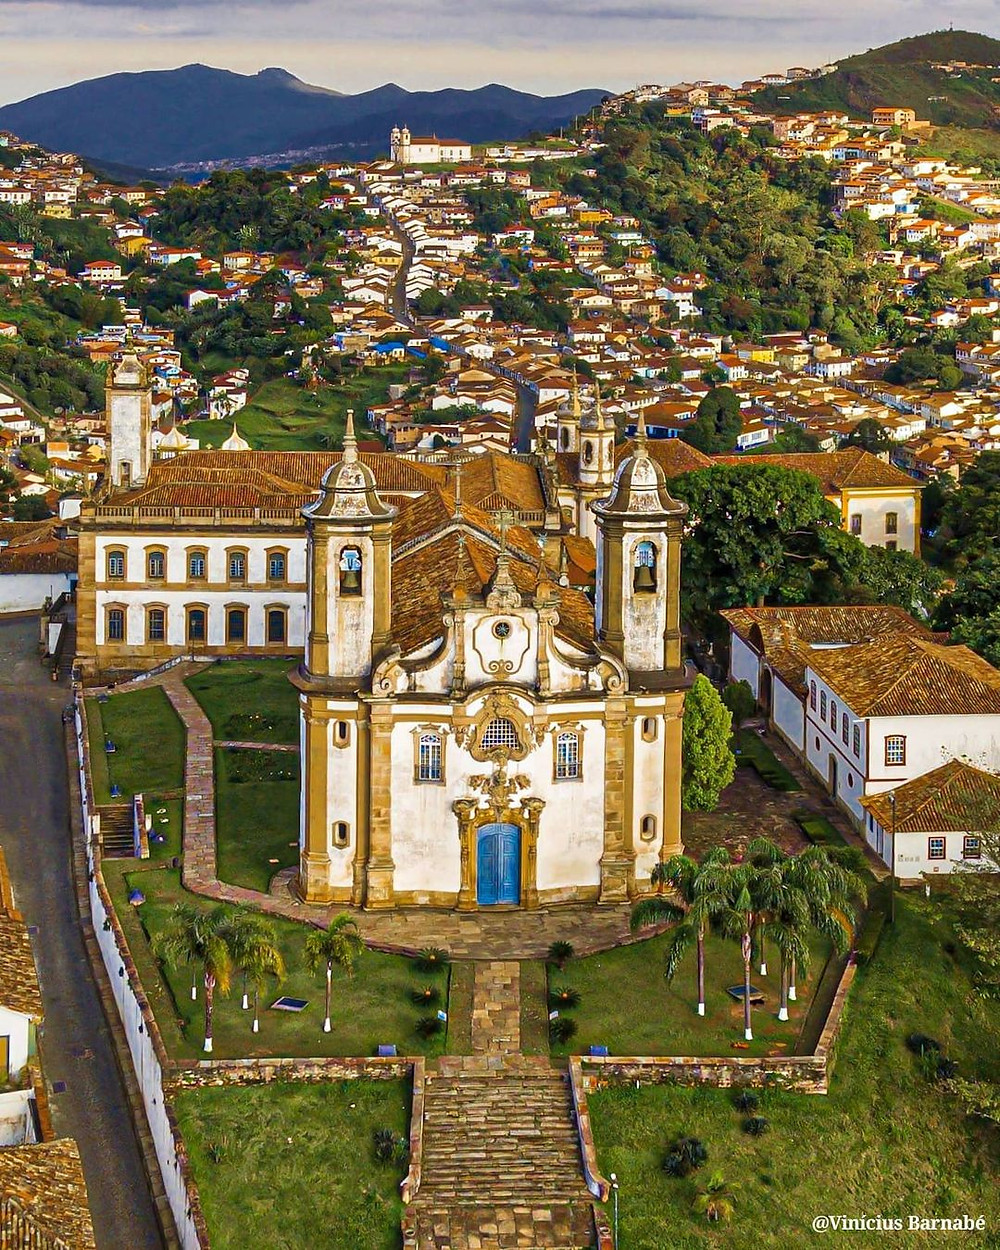 Carnaval de Ouro Preto